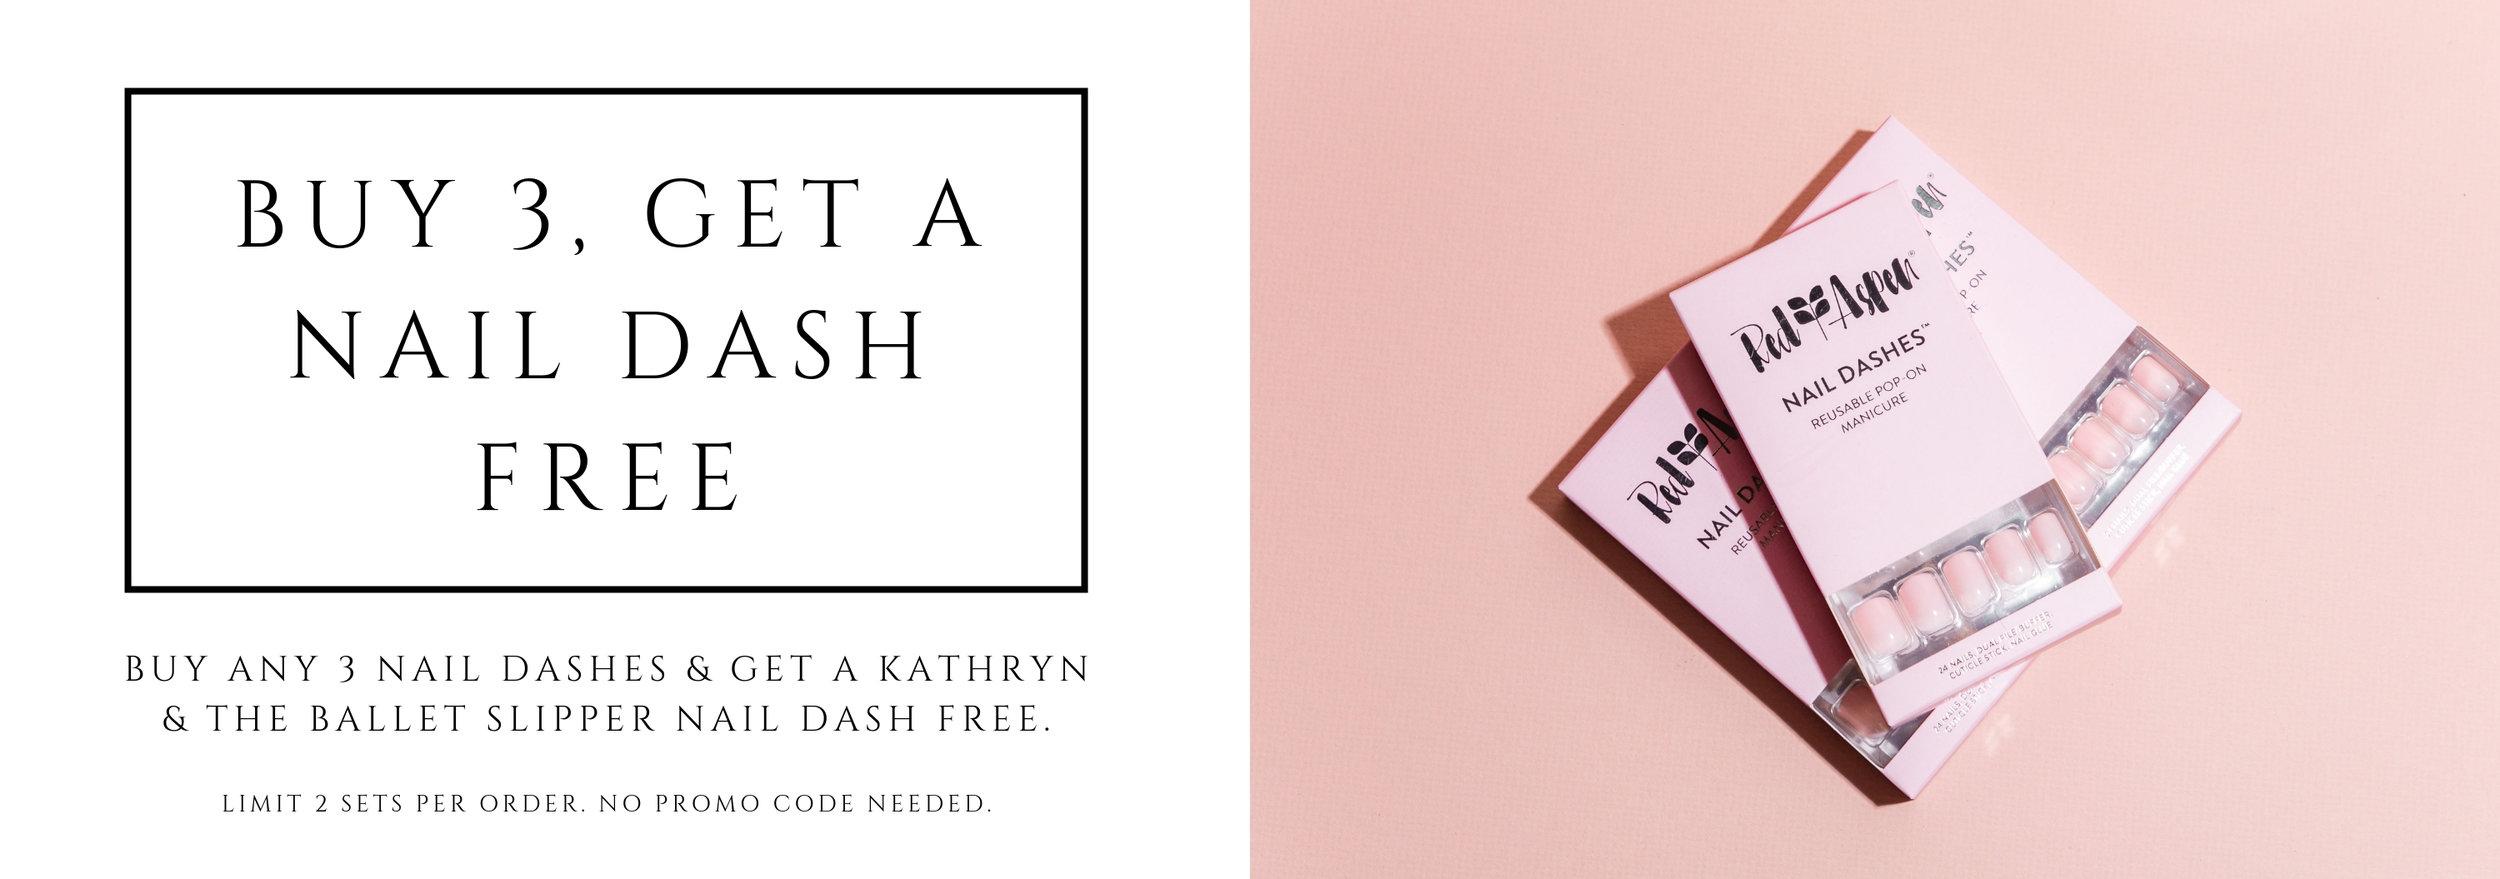 Buy 3, get a Kathryn & the ballet slipper nail dash.jpg